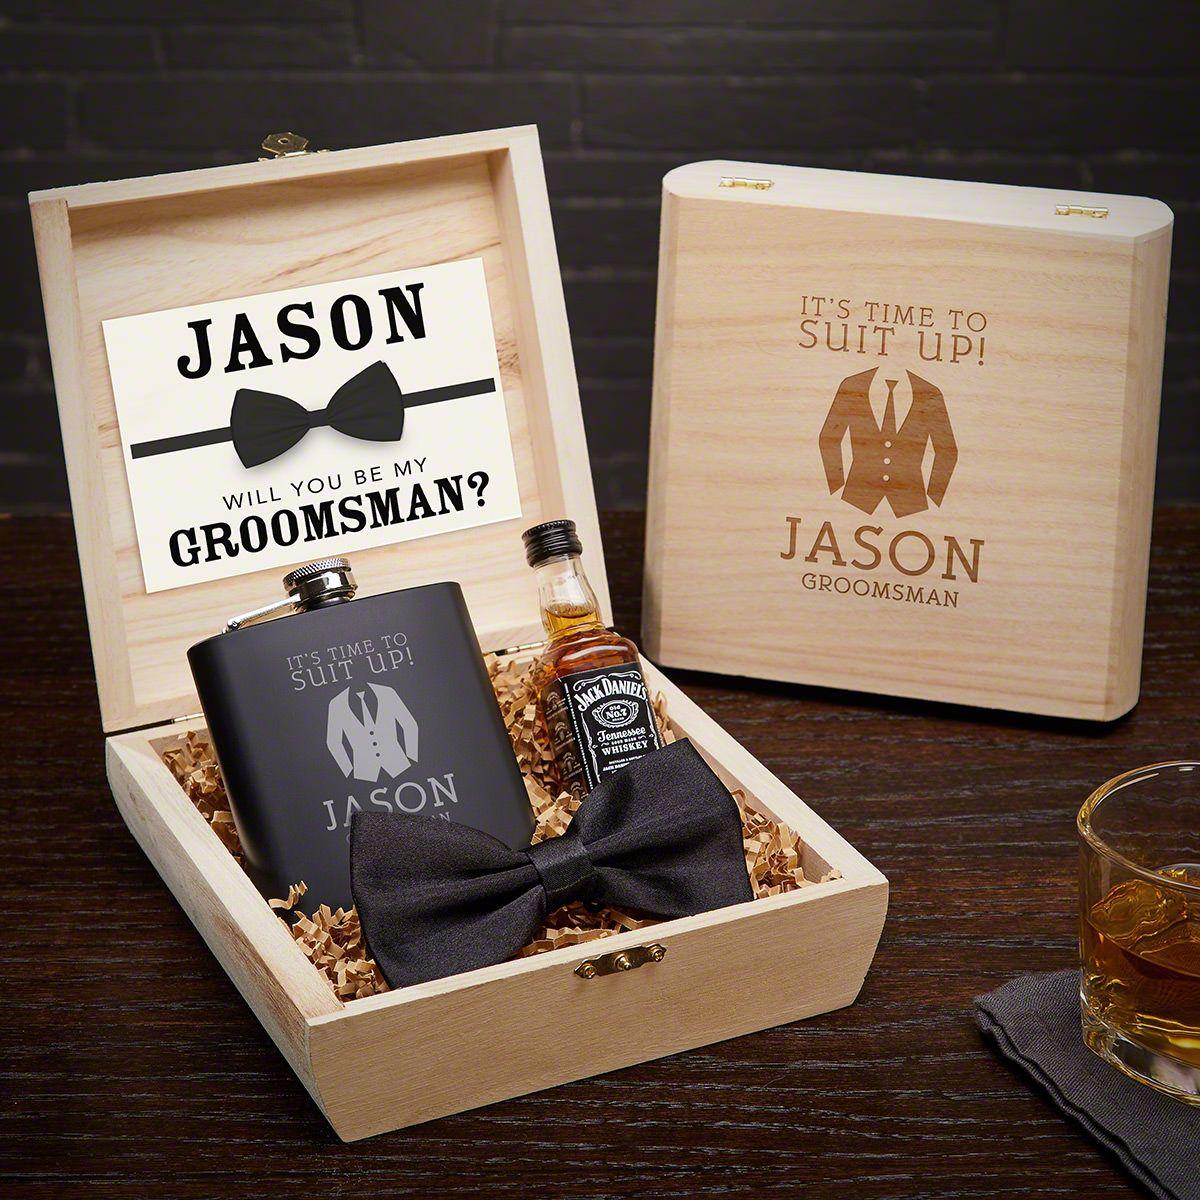 Suit Up Custom Groomsman Proposal Gift Box